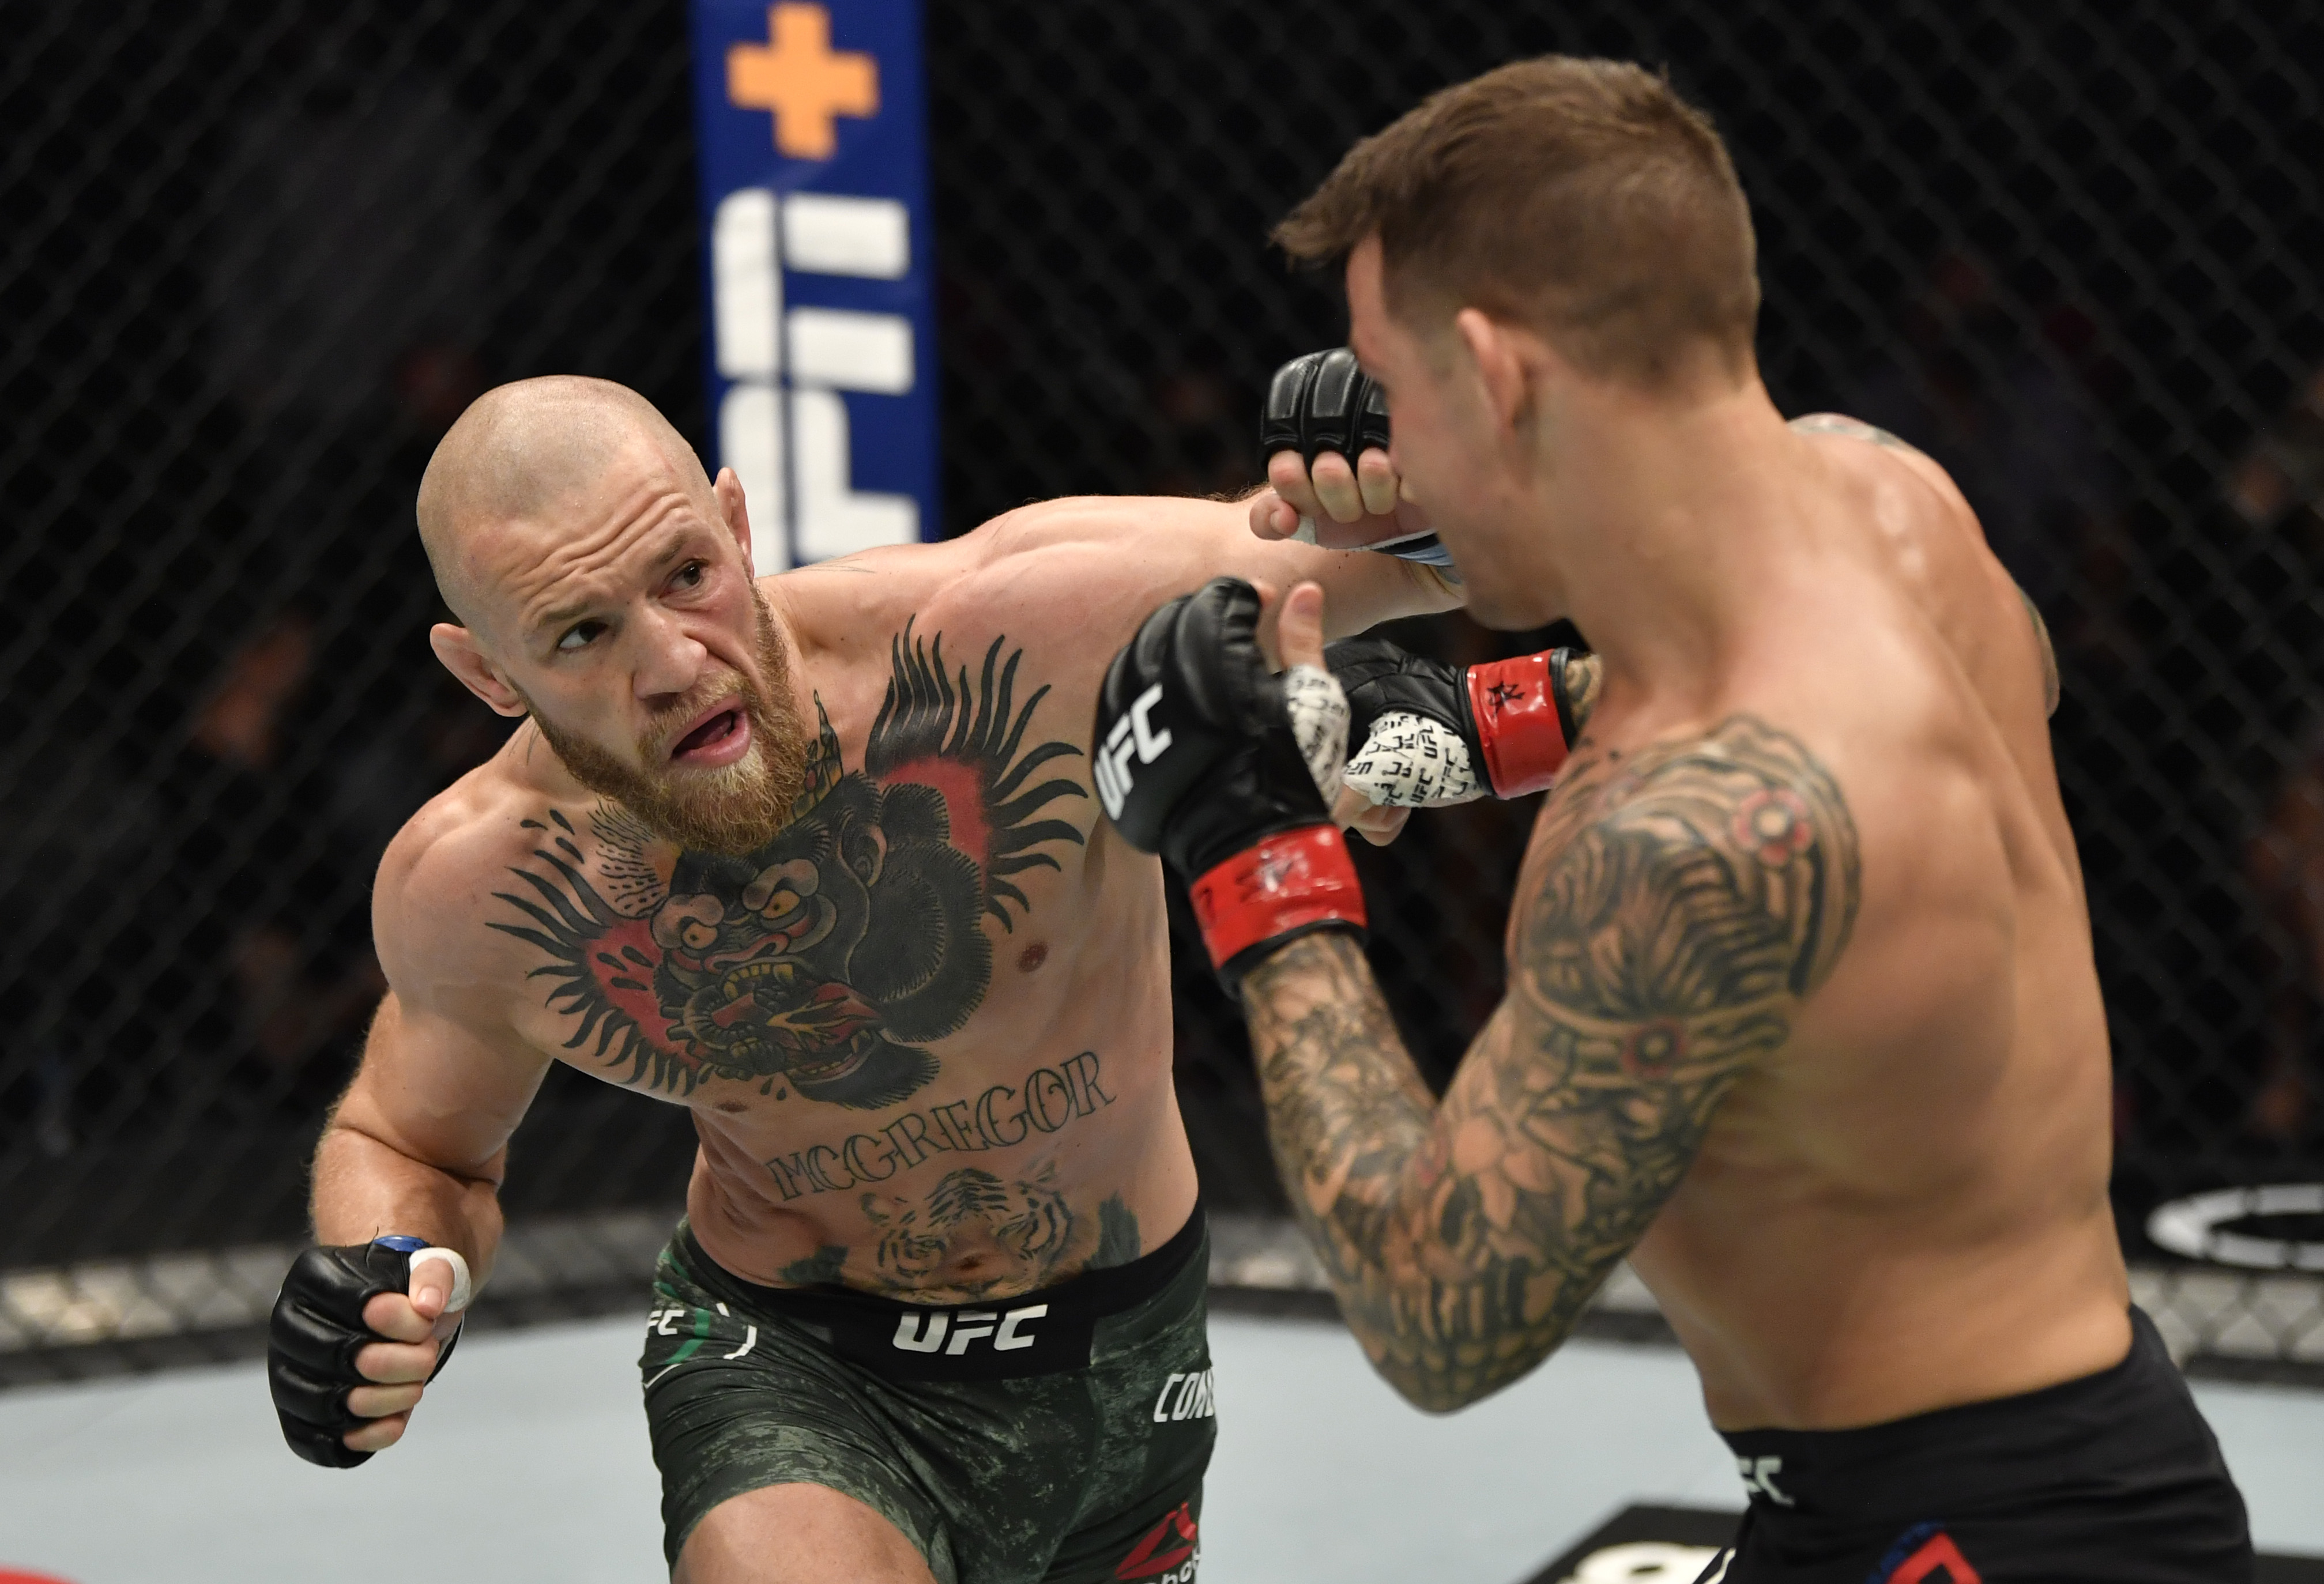 Prop Bets for McGregor-Poirier Press Conference & Fight